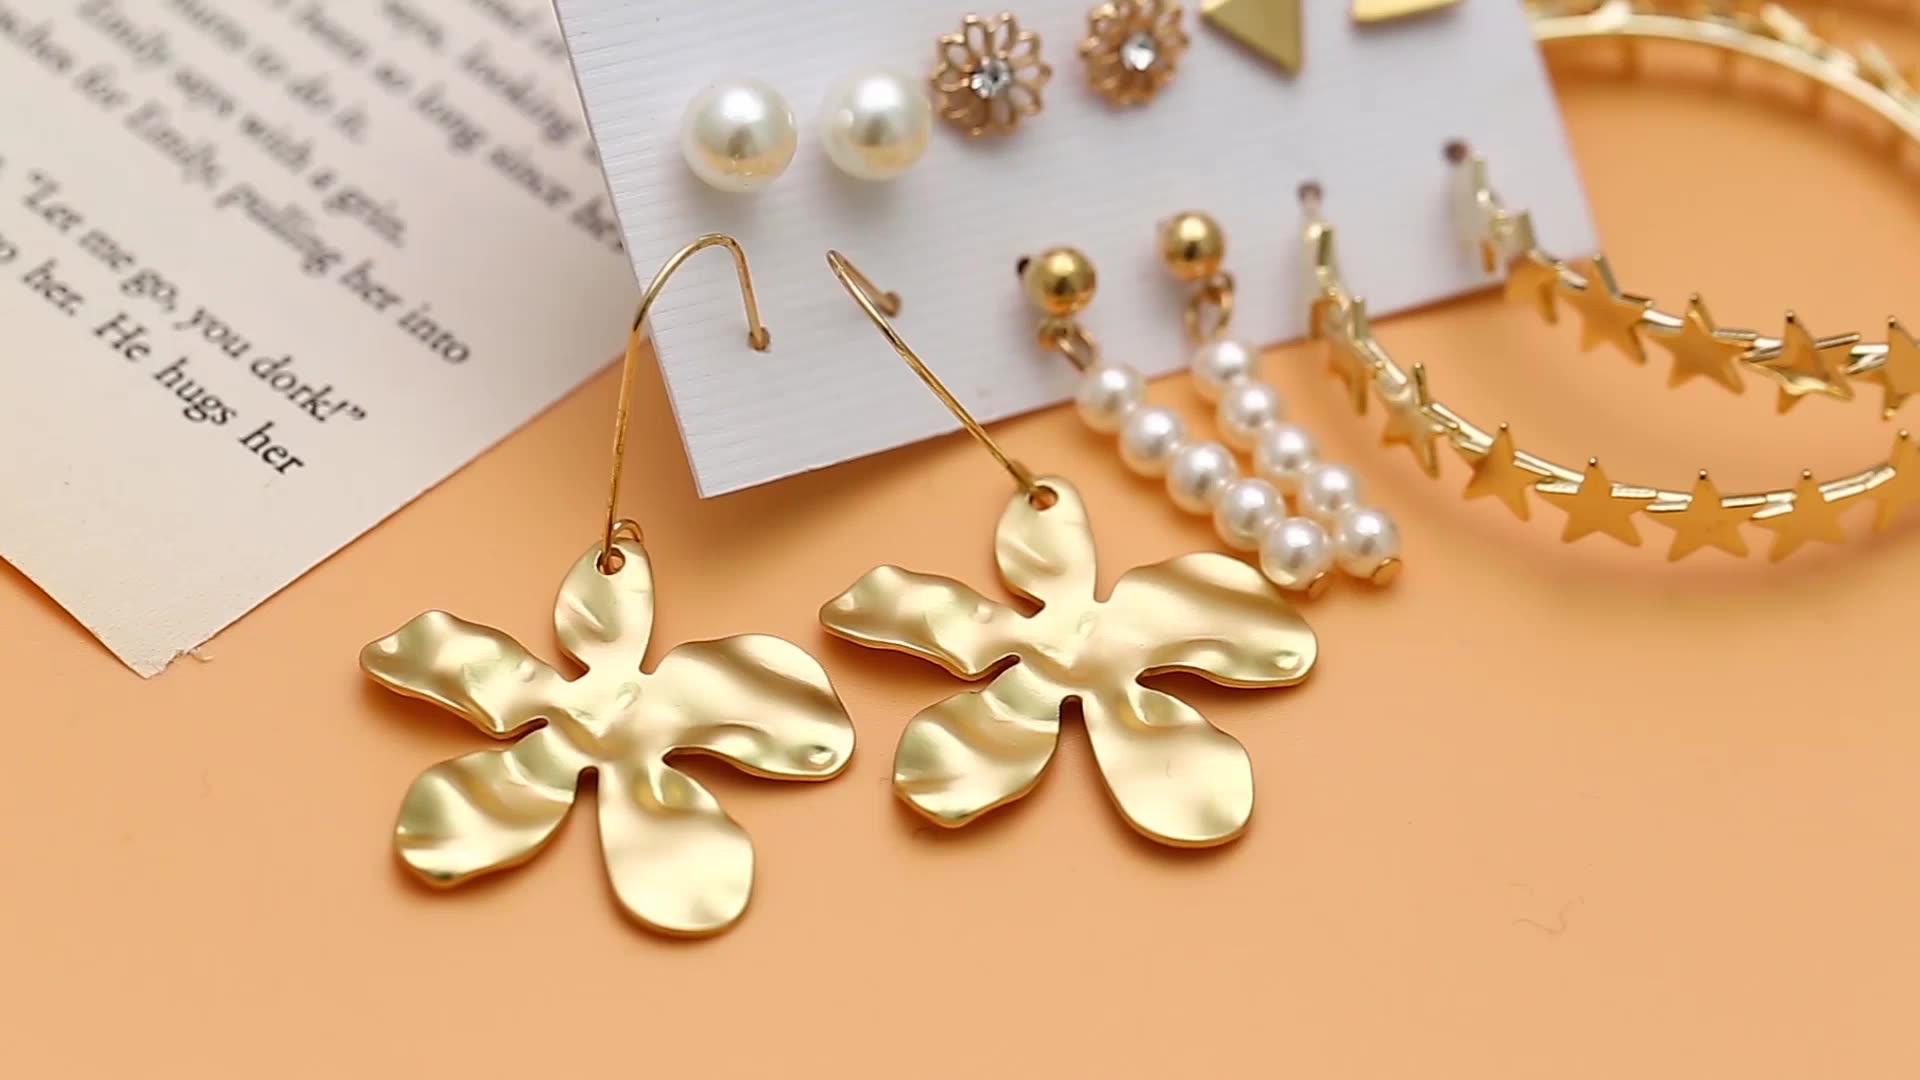 2020 Fashion Trendy Earring Set Popular Jewelry Mixed Designs Pin Post Hoop Earrings Set Resin Pearl Tassel Designs for Women